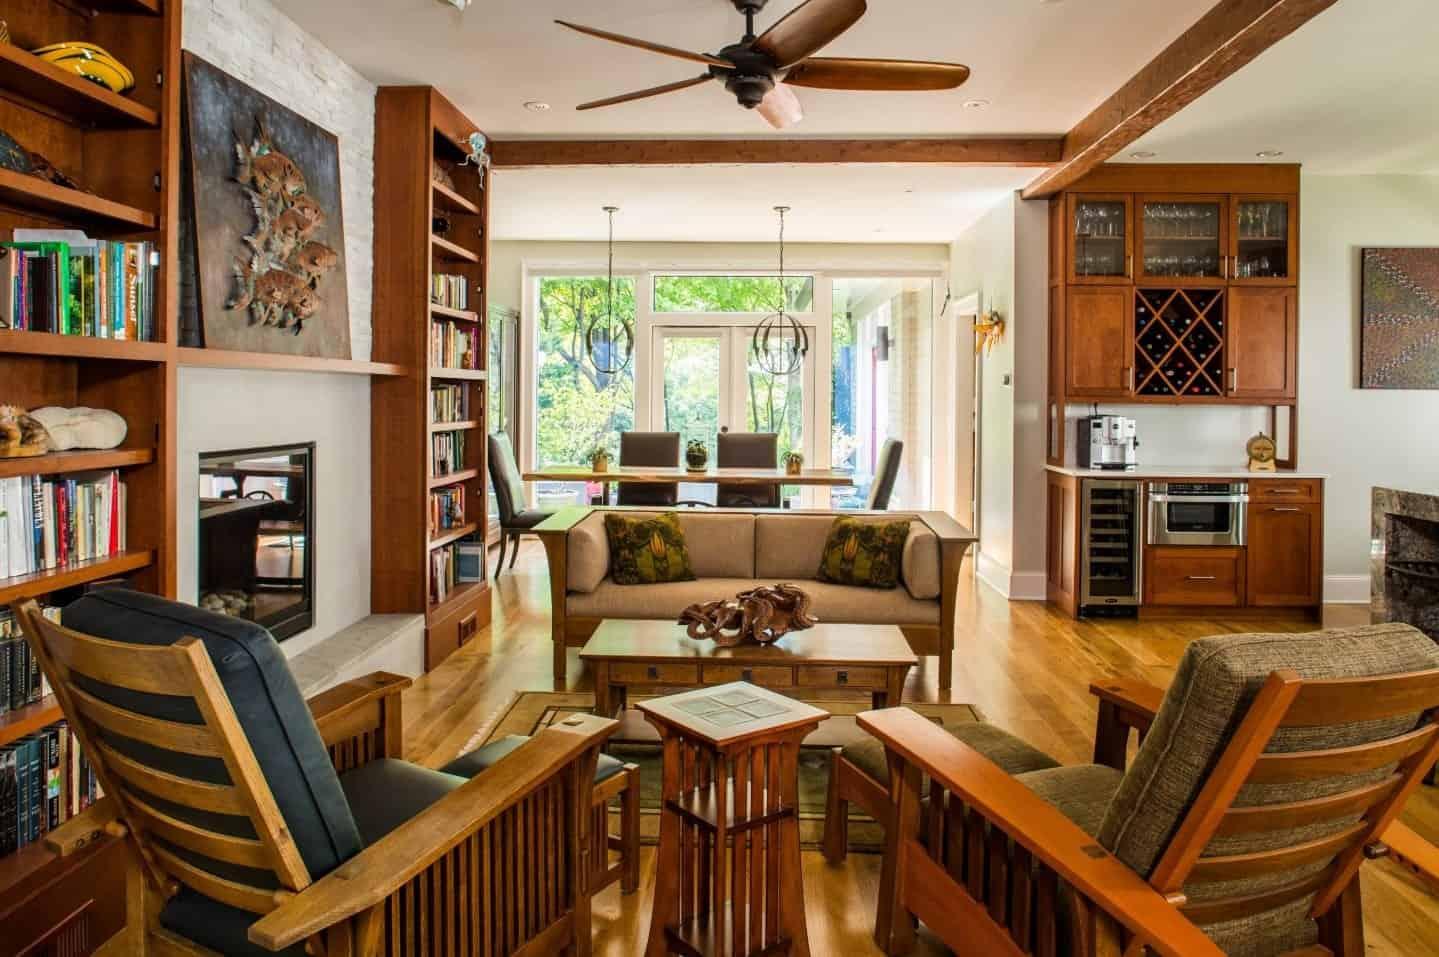 astonishing mission style living room design | 40 Craftsman-Style Living Room Ideas (Photos)